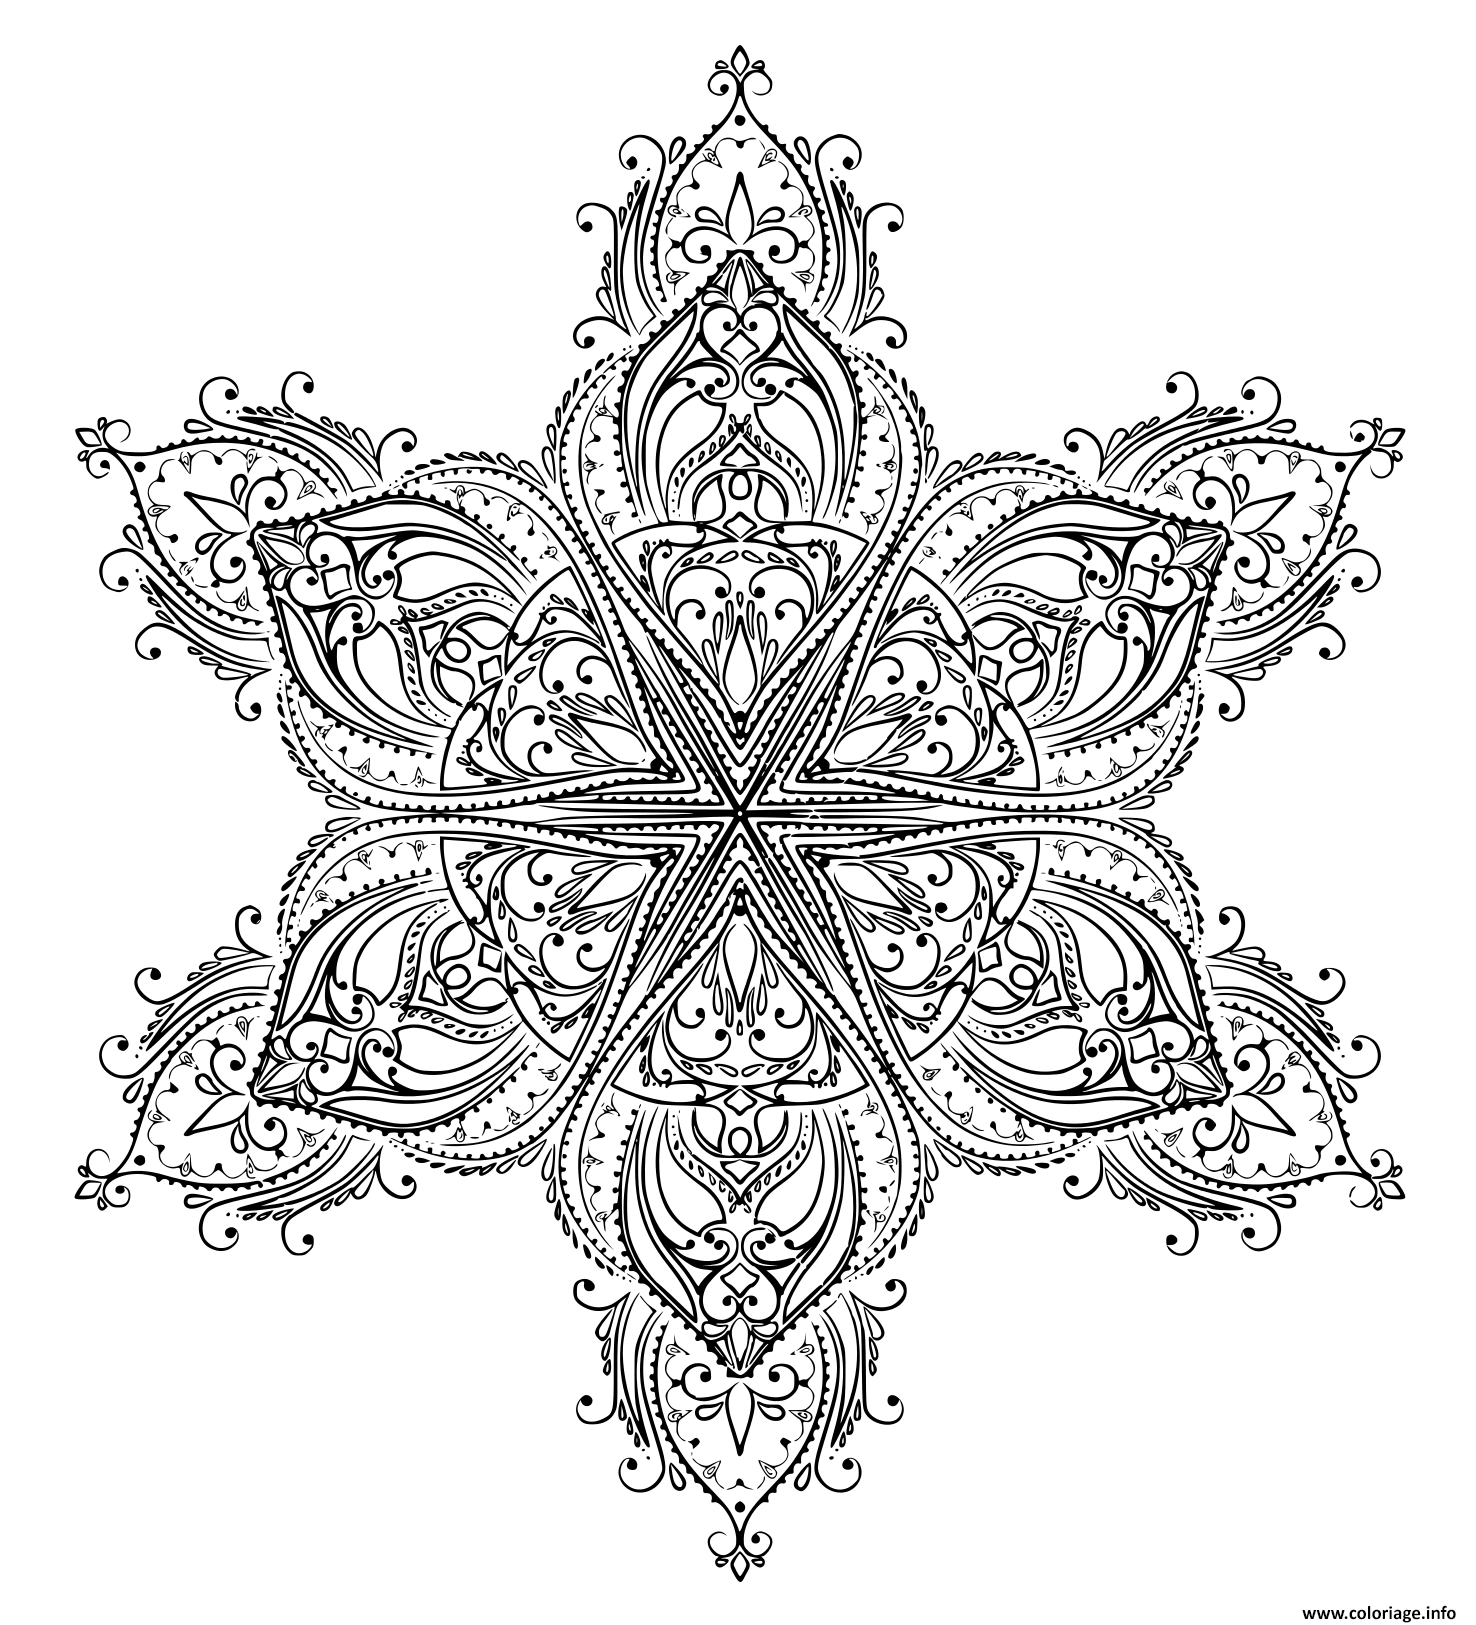 Coloriage Mandala Forme Etoile Jecolorie Com